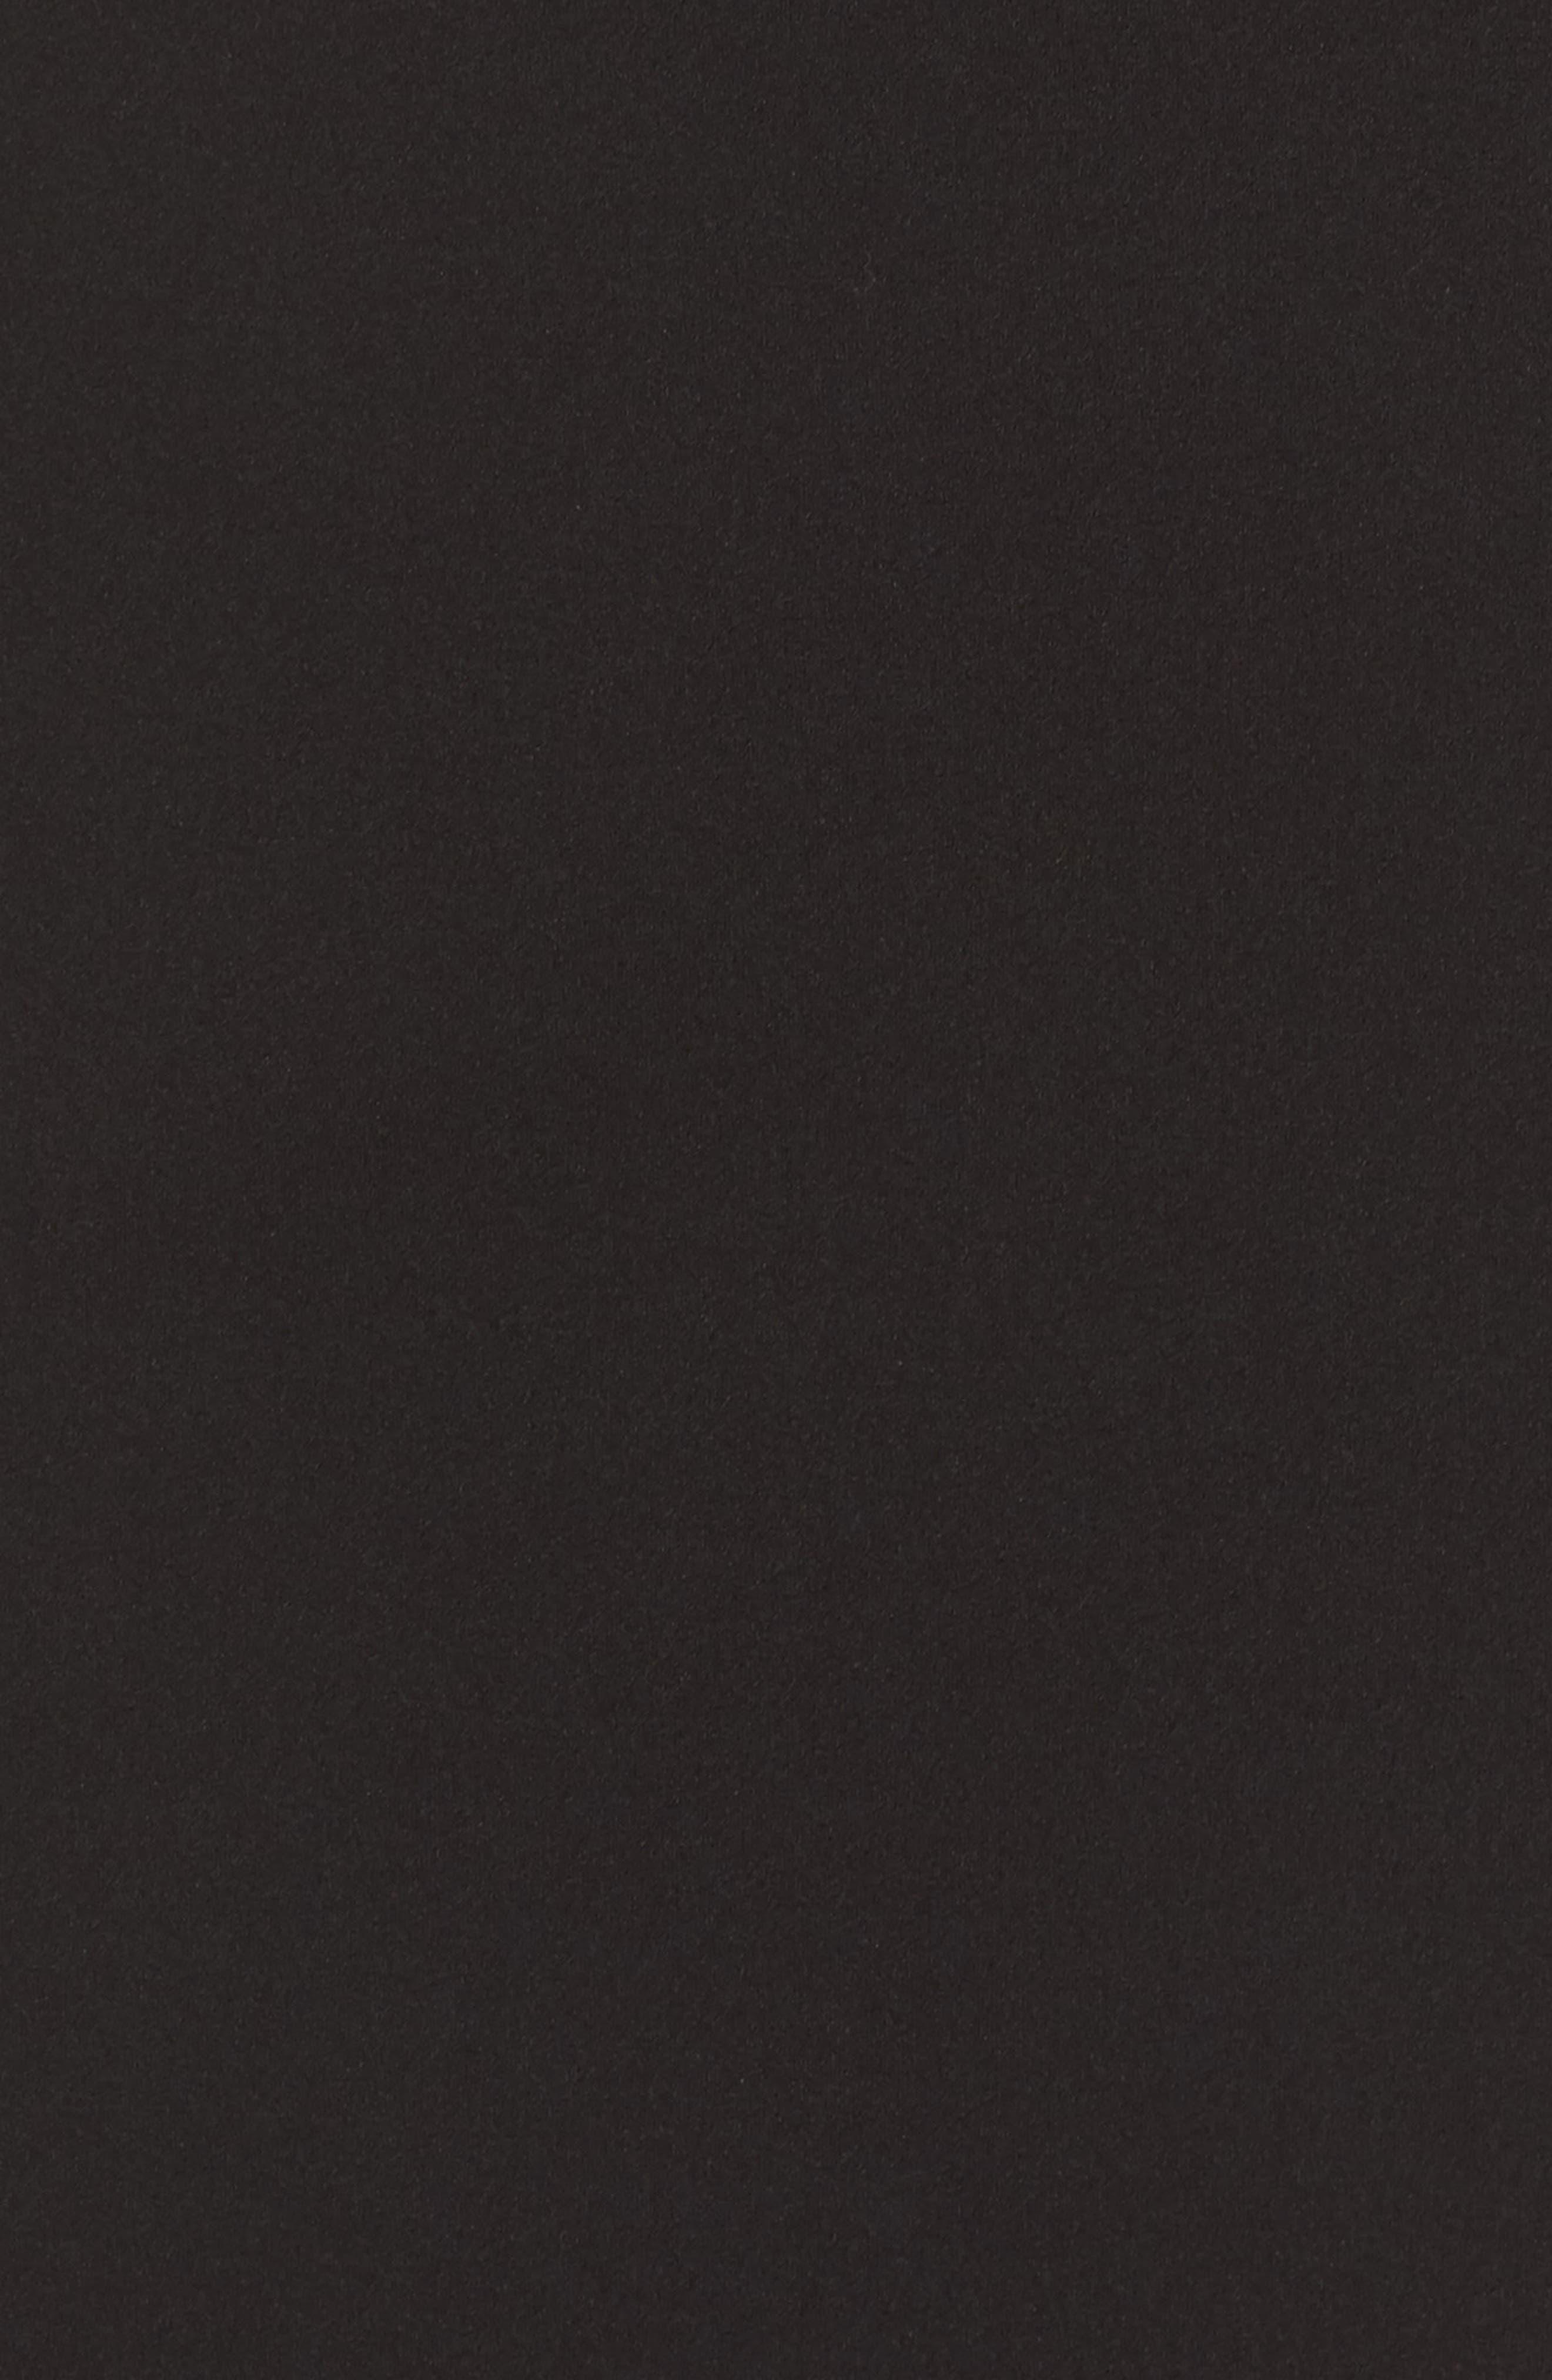 Pleat Ruffle Off the Shoulder Dress,                             Alternate thumbnail 5, color,                             Black